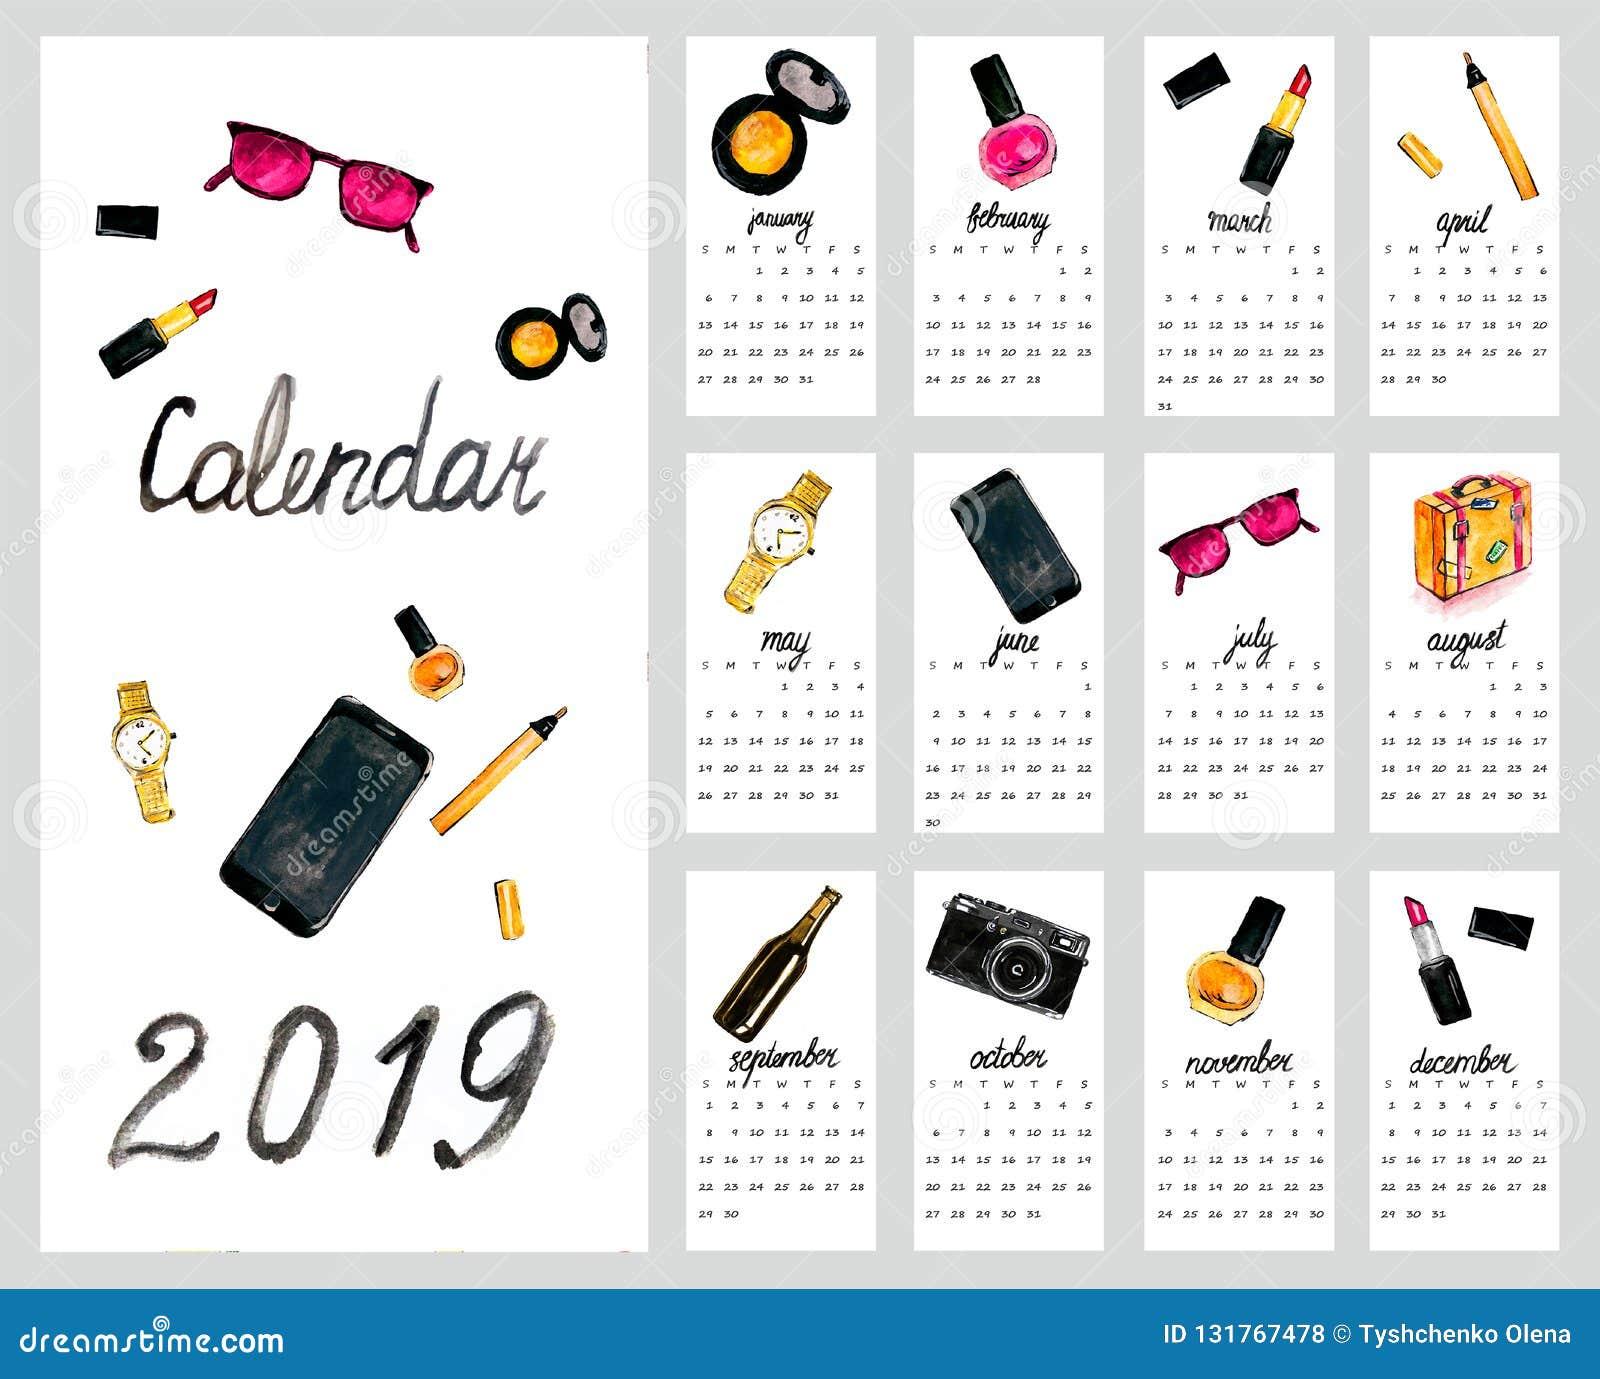 Illustration Calendrier.Calendar 2019 Cute Monthly Calendar With Women S